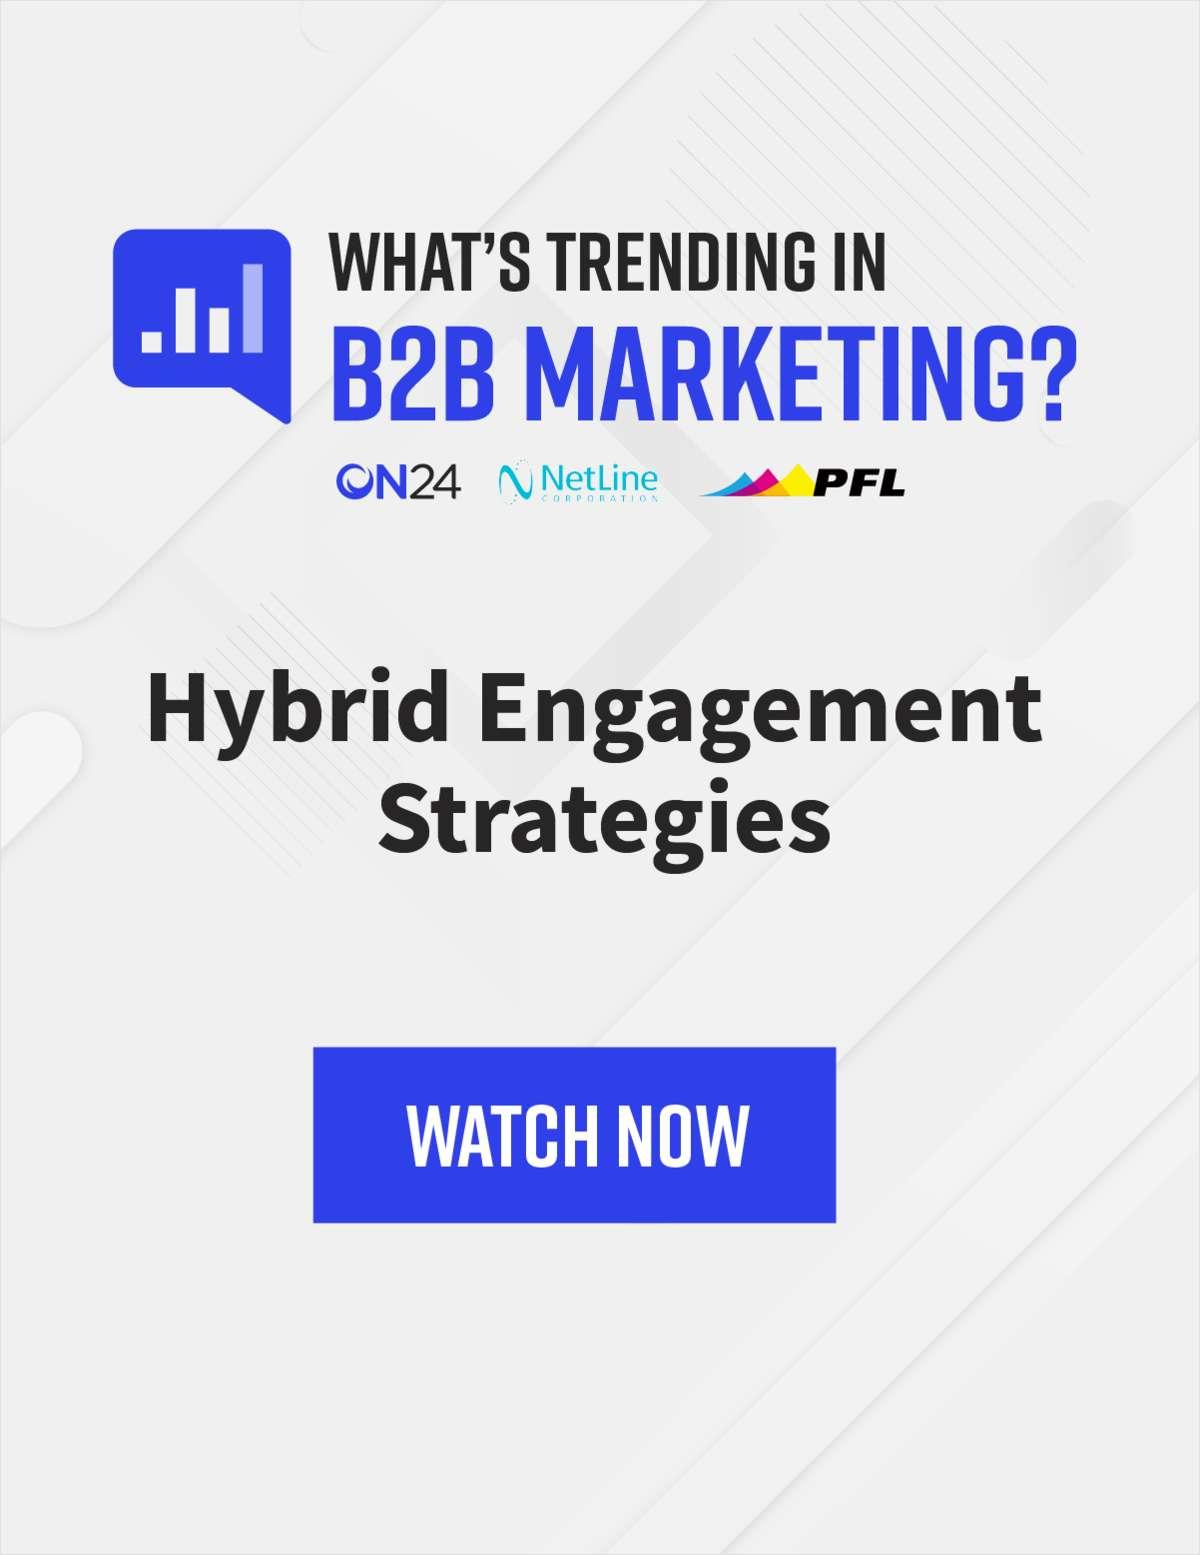 What's Trending in B2B Marketing? Hybrid Engagement Strategies